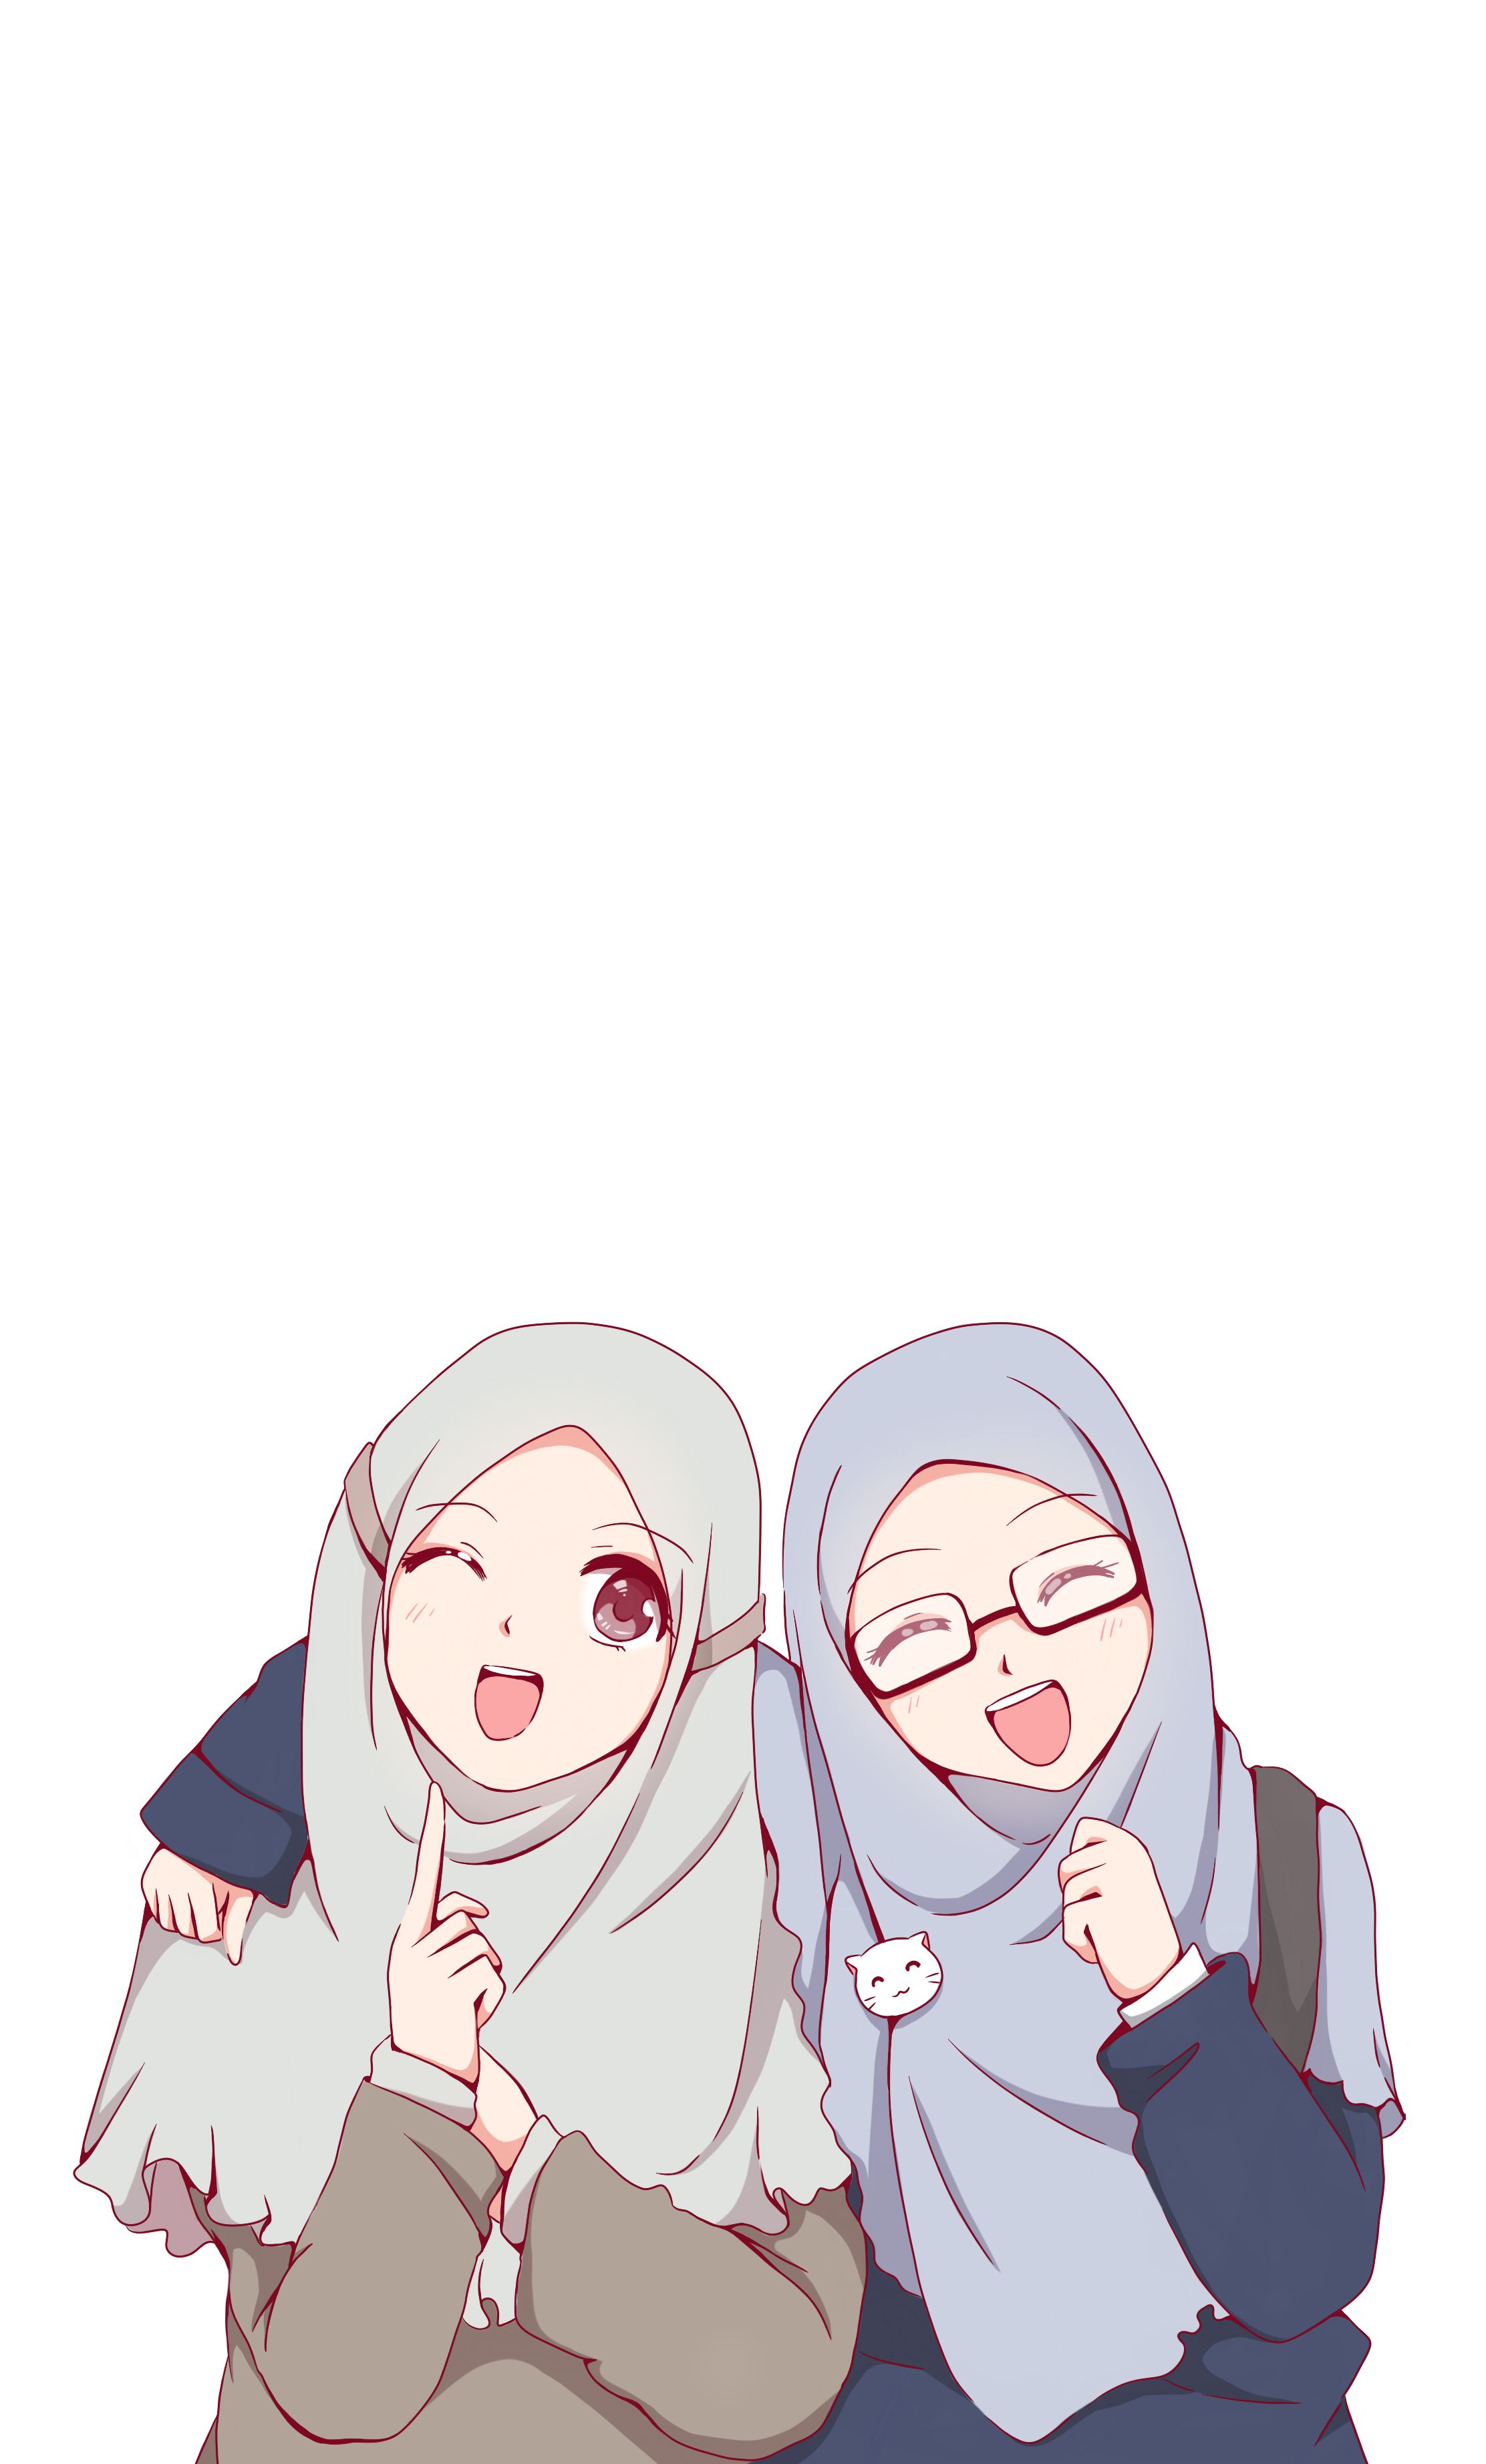 Wallpaper Hijab Girl Cartoon Anime Muslimah Cute Novocom Top